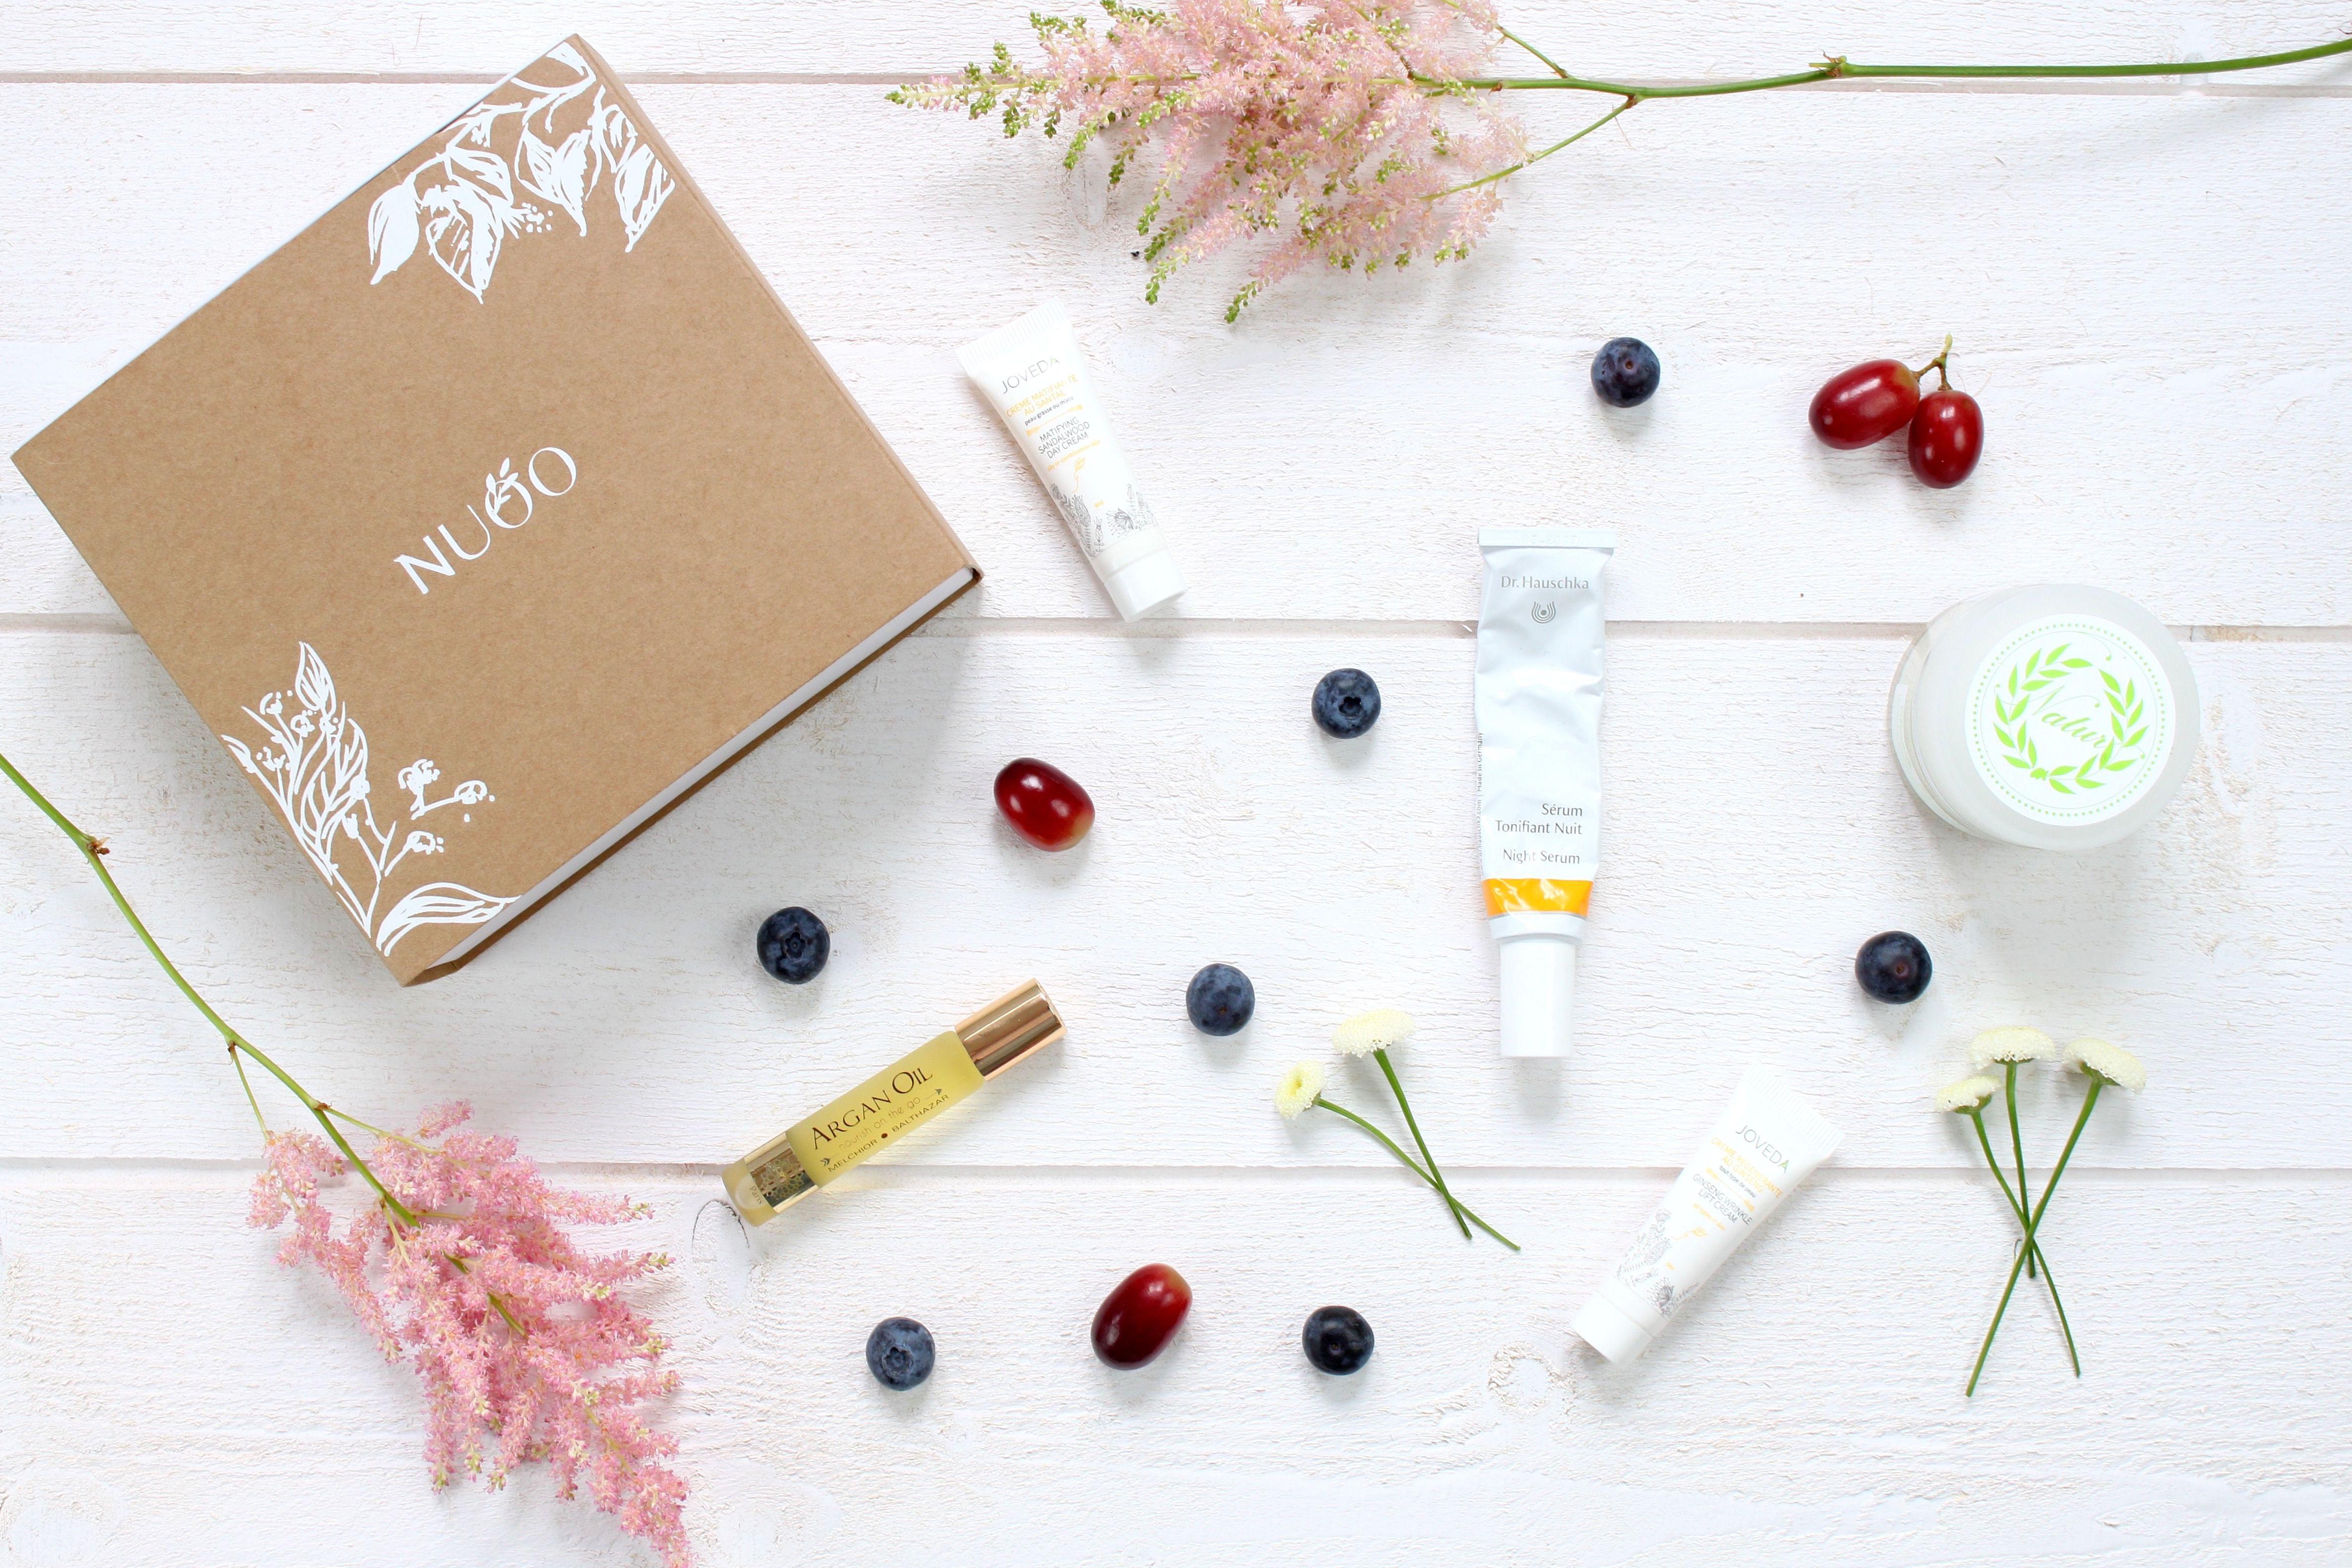 Box de mai sur www.nuoobox.com #beautybox #vegan #bio #box #organic #natural #nontoxic #beauty #naturalbeauty #organicbeauty #healthy #green #greenchic #fun #colors #detox #beautebio #beautybox